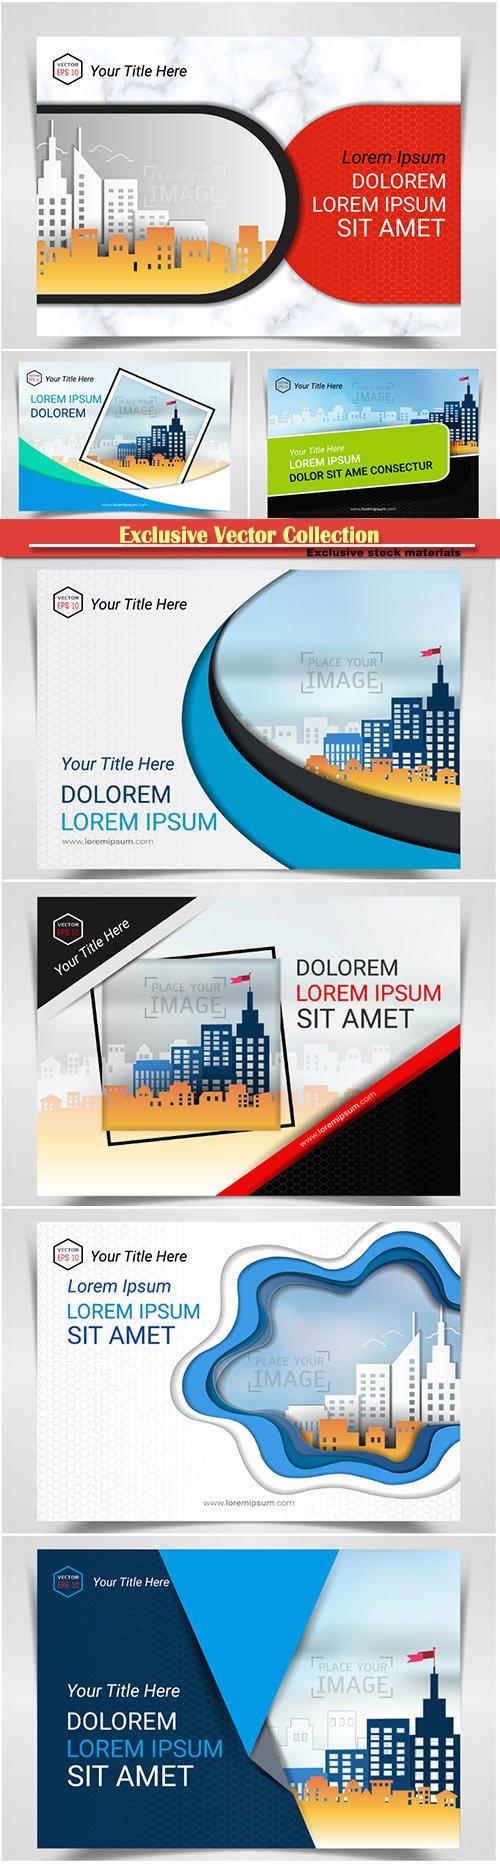 Brochure cover design vector template # 6